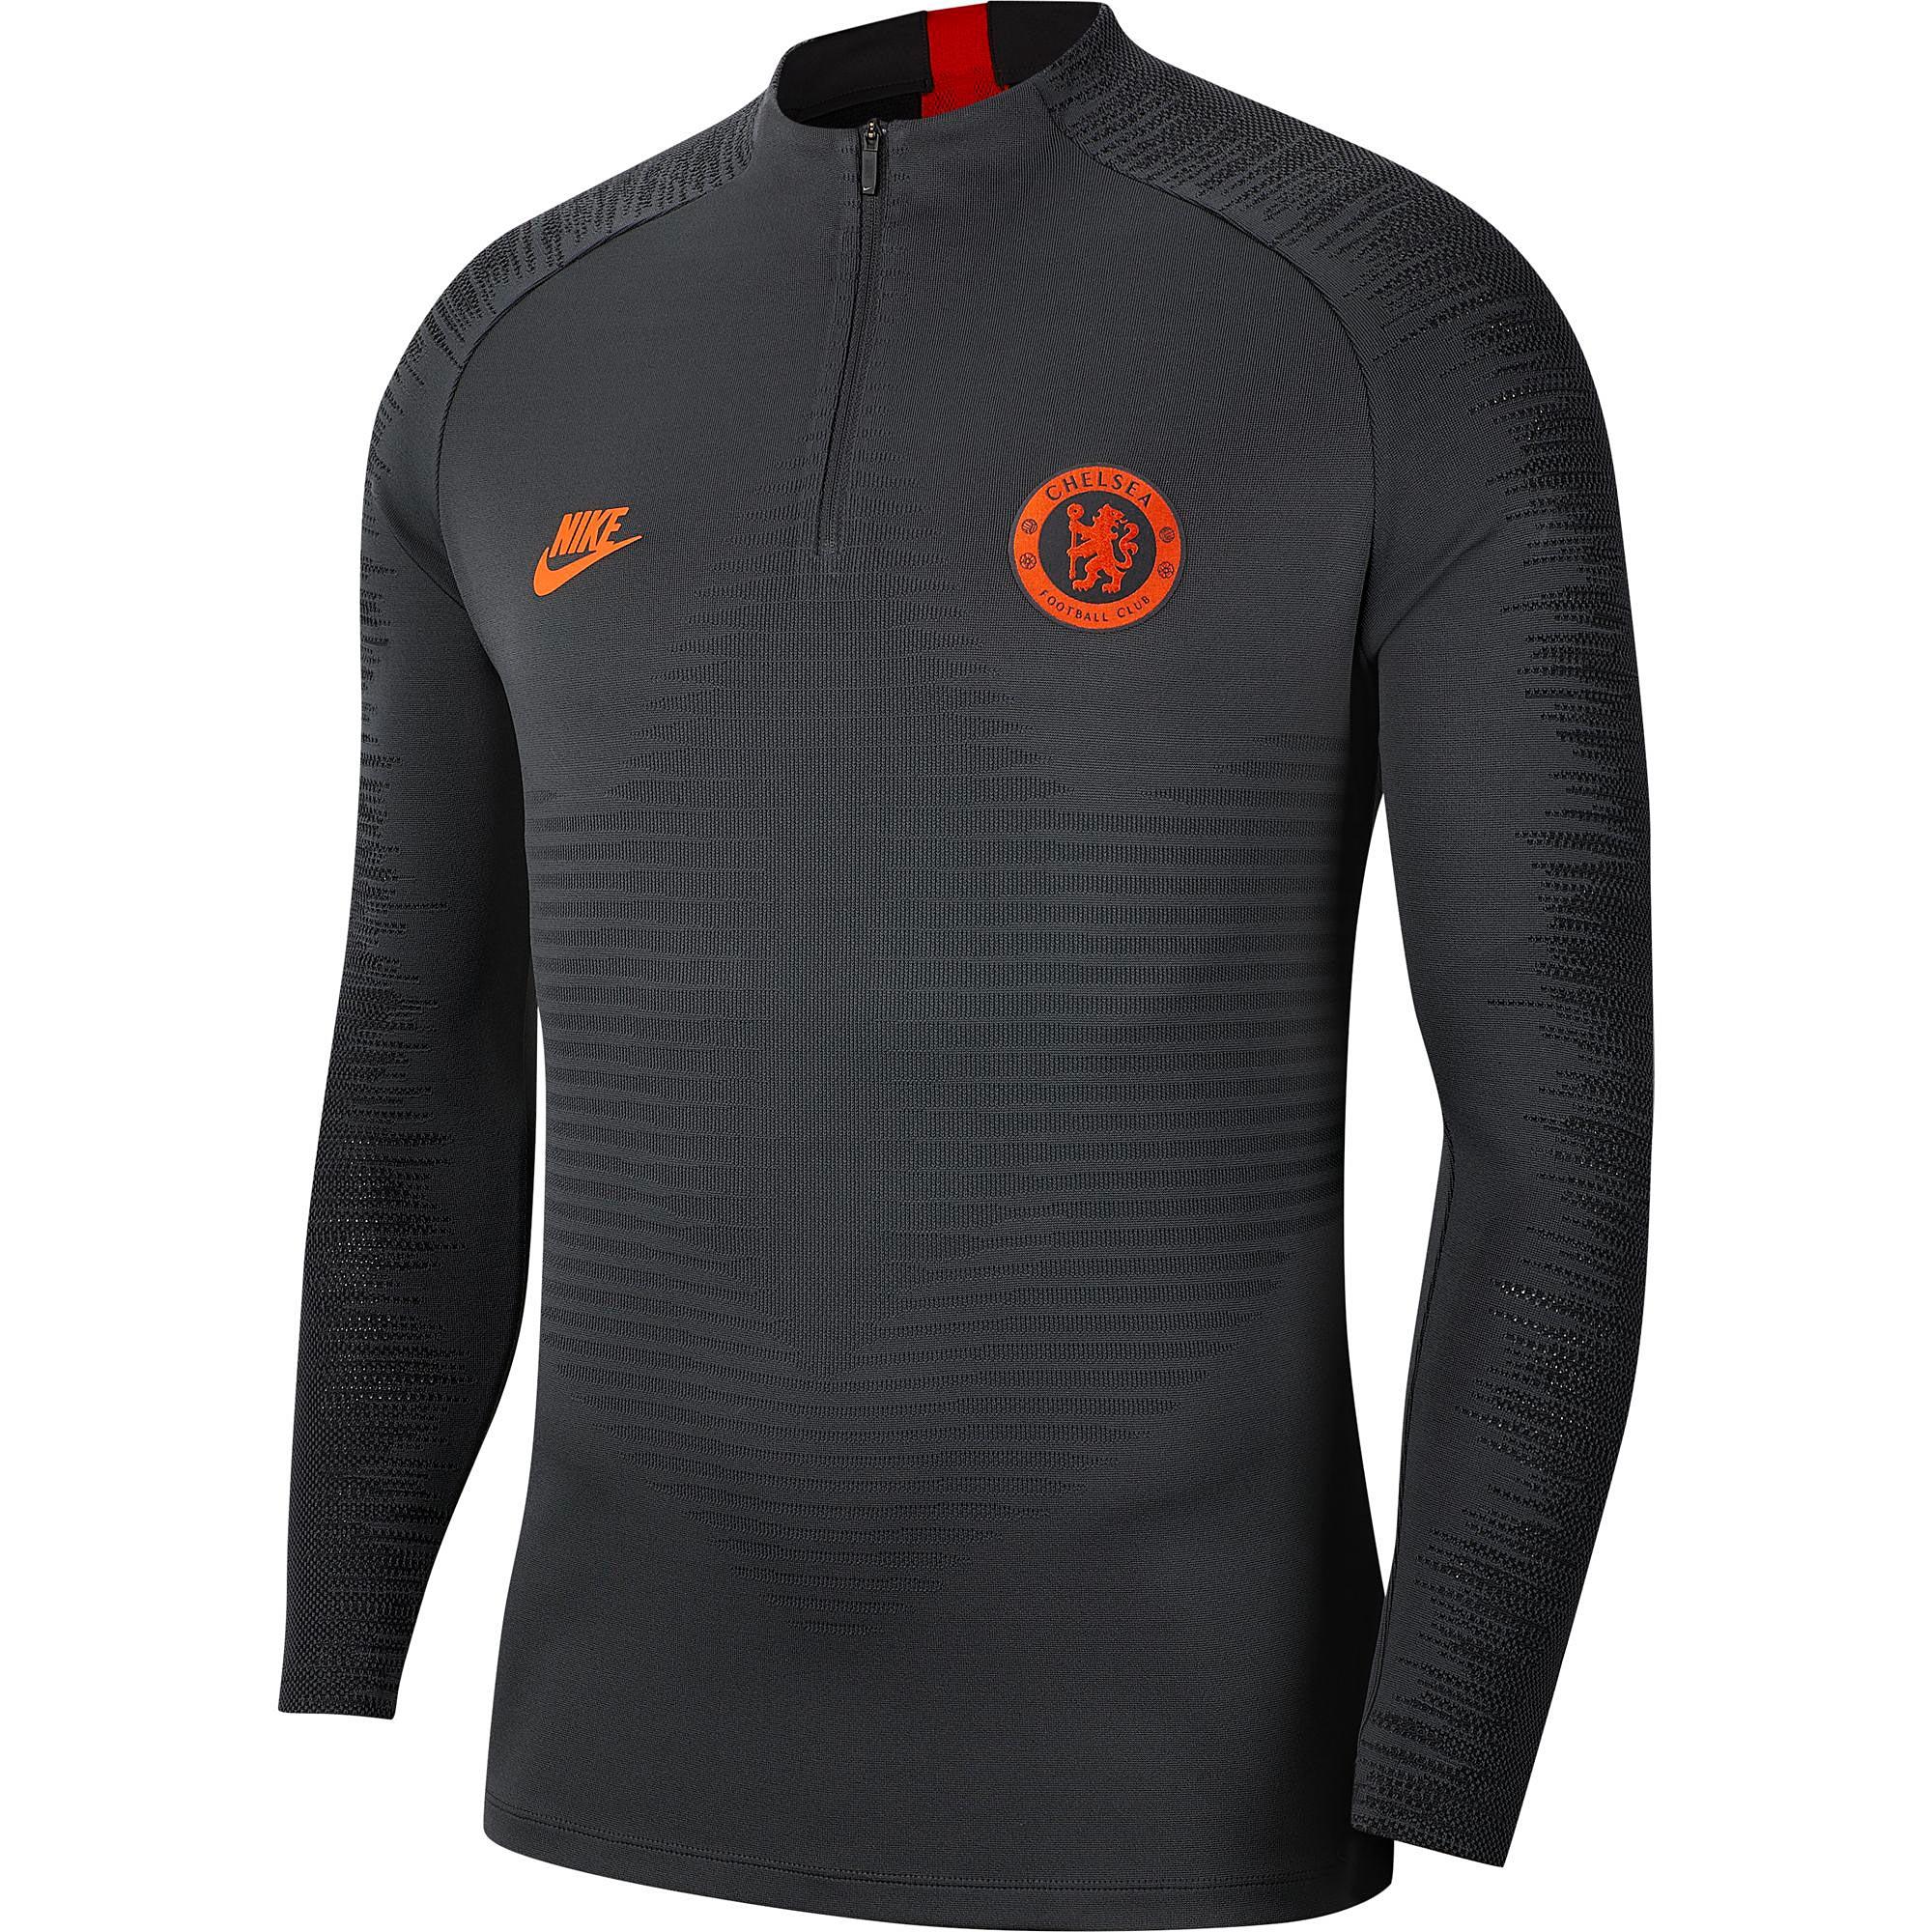 Nike / Camiseta Vaporknit Strike Drill del Chelsea en gris